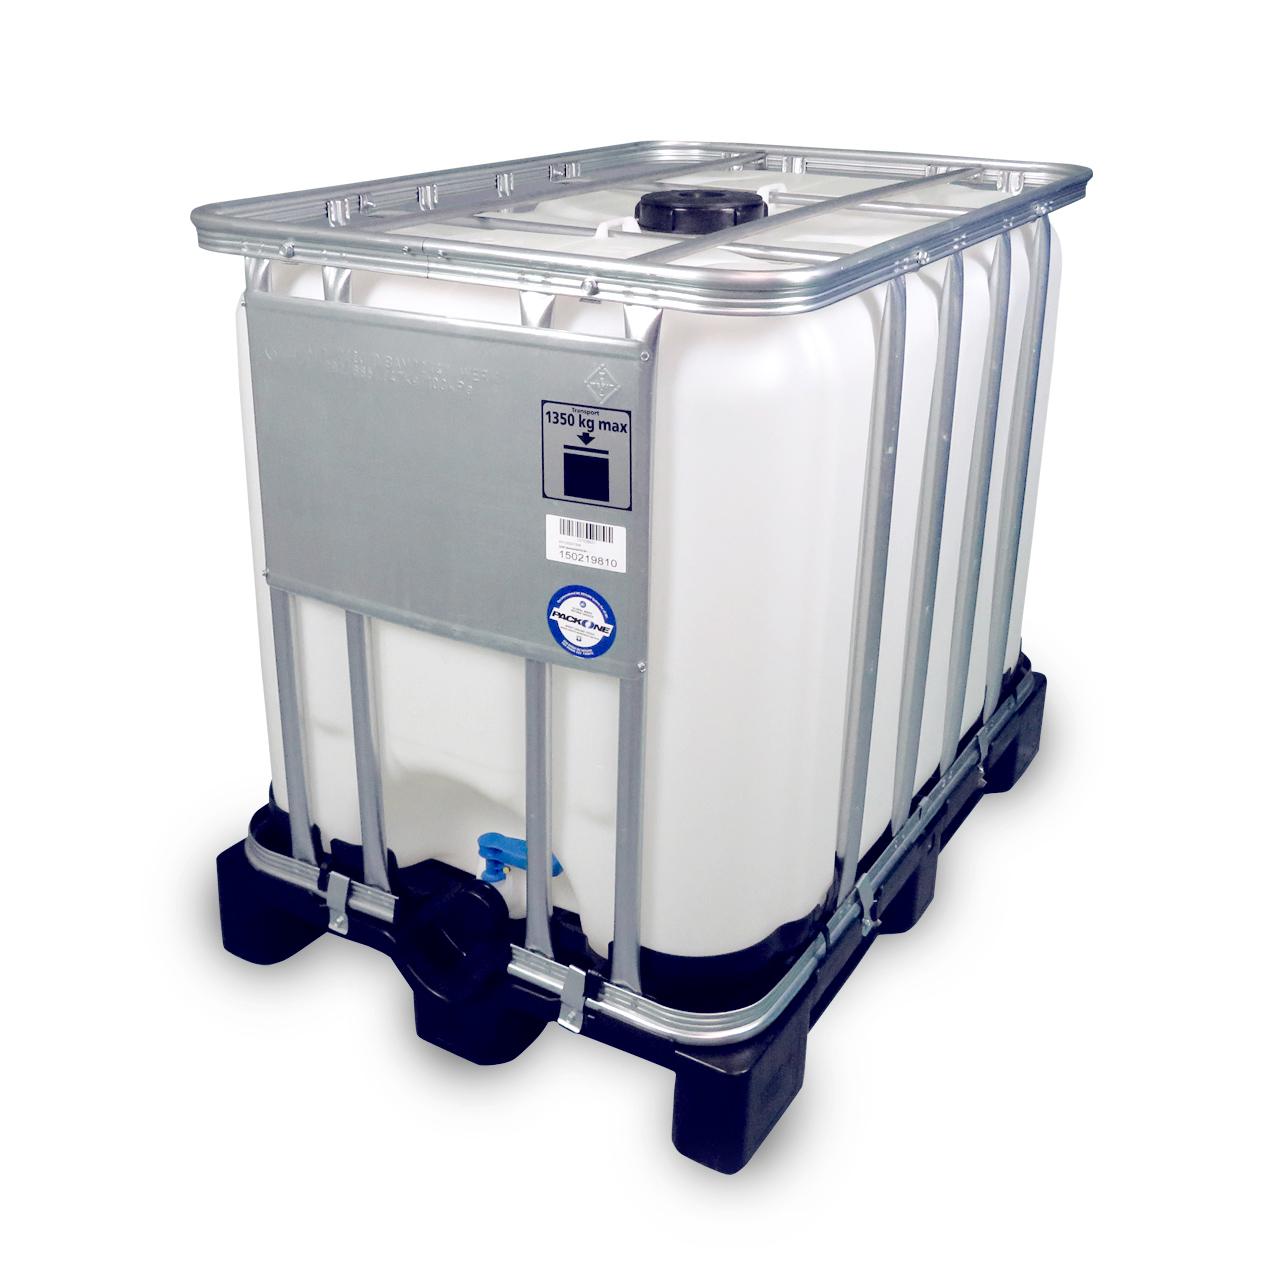 600 L IBC Container, Kunststoff-Palette, 150/50, UN Zulassung